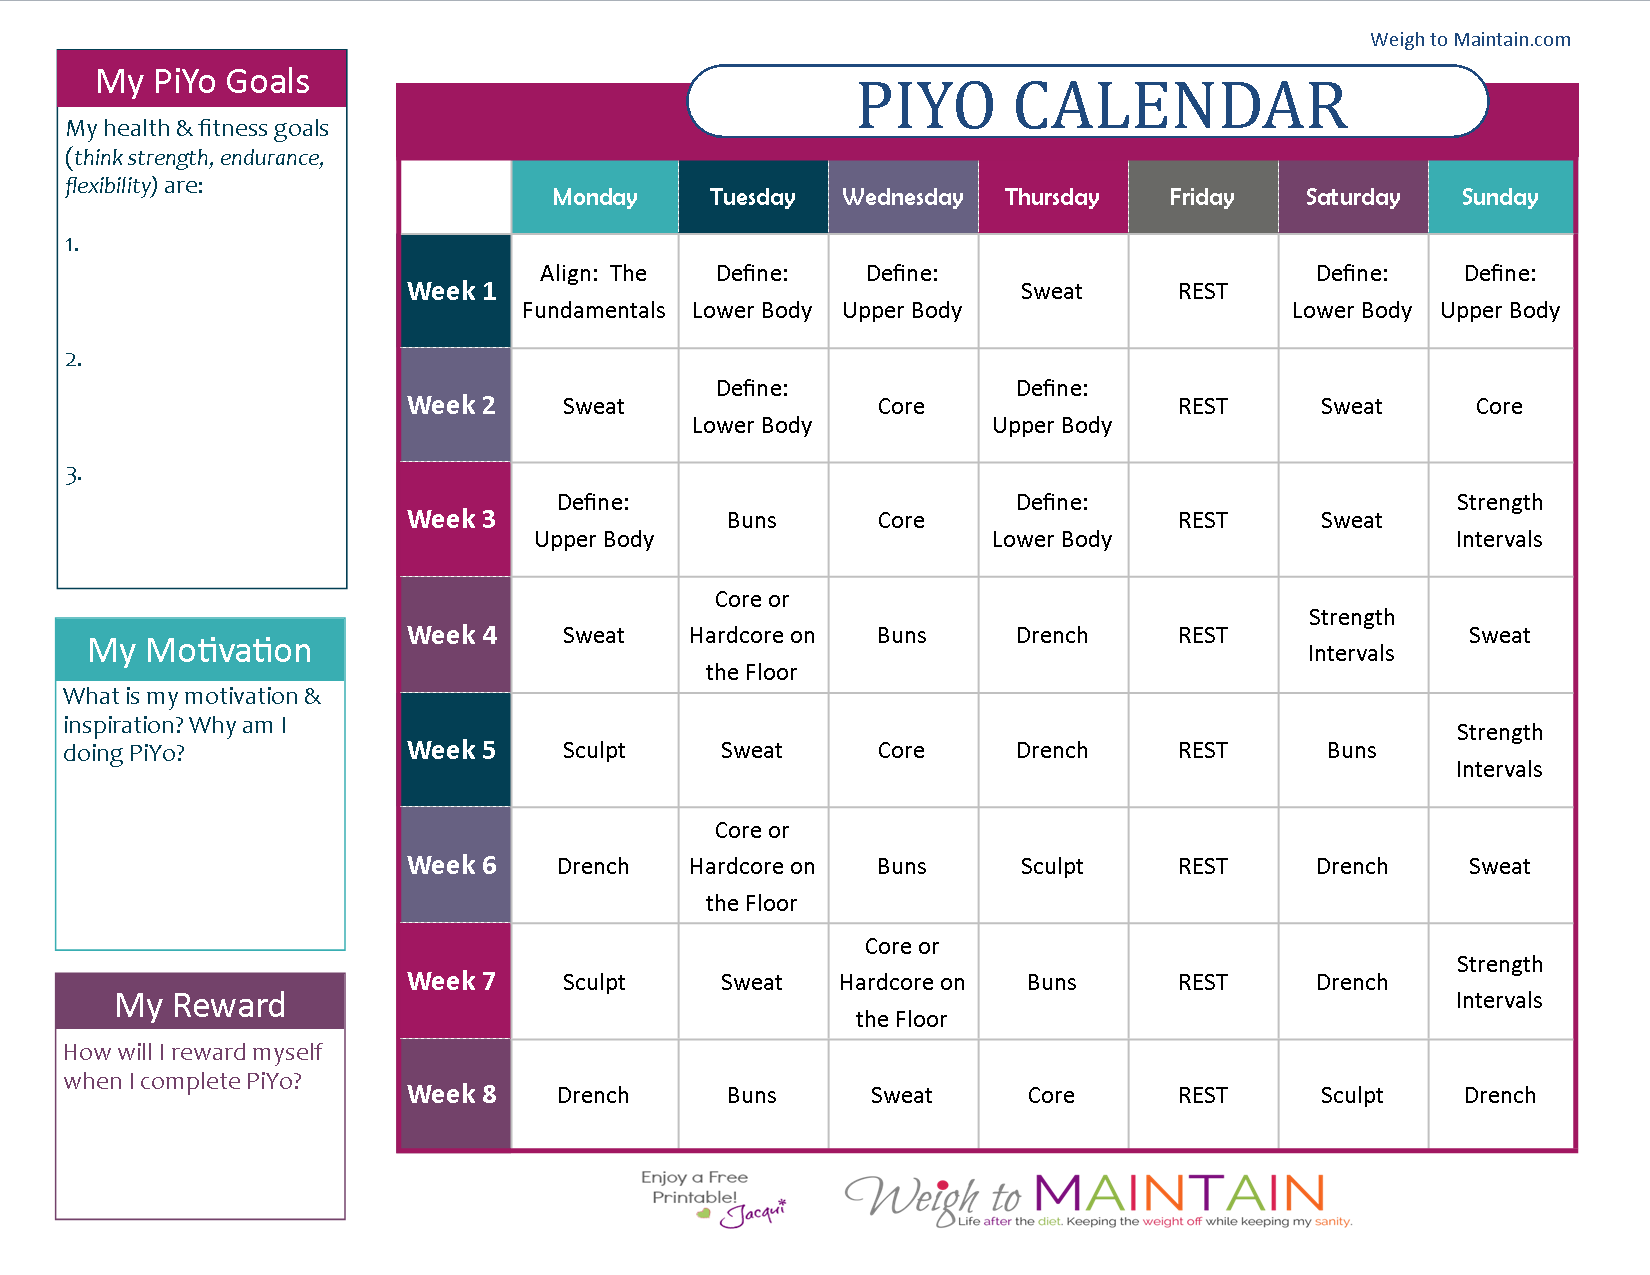 Printable Piyo Calendar And Workout Schedule